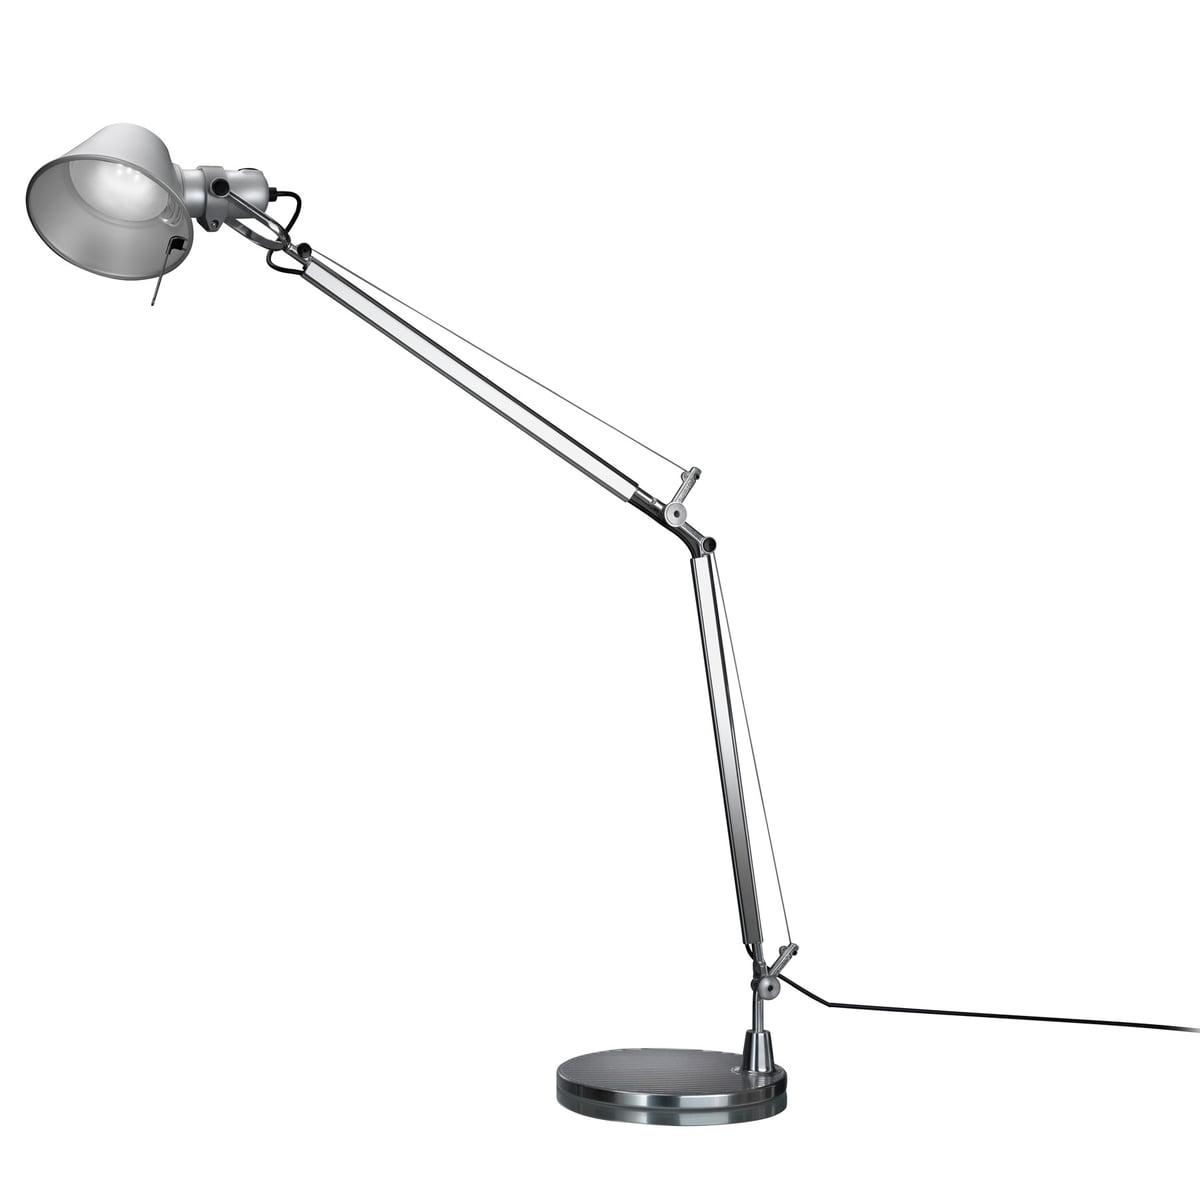 artemide tolomeo tavolo led lampe de table. Black Bedroom Furniture Sets. Home Design Ideas